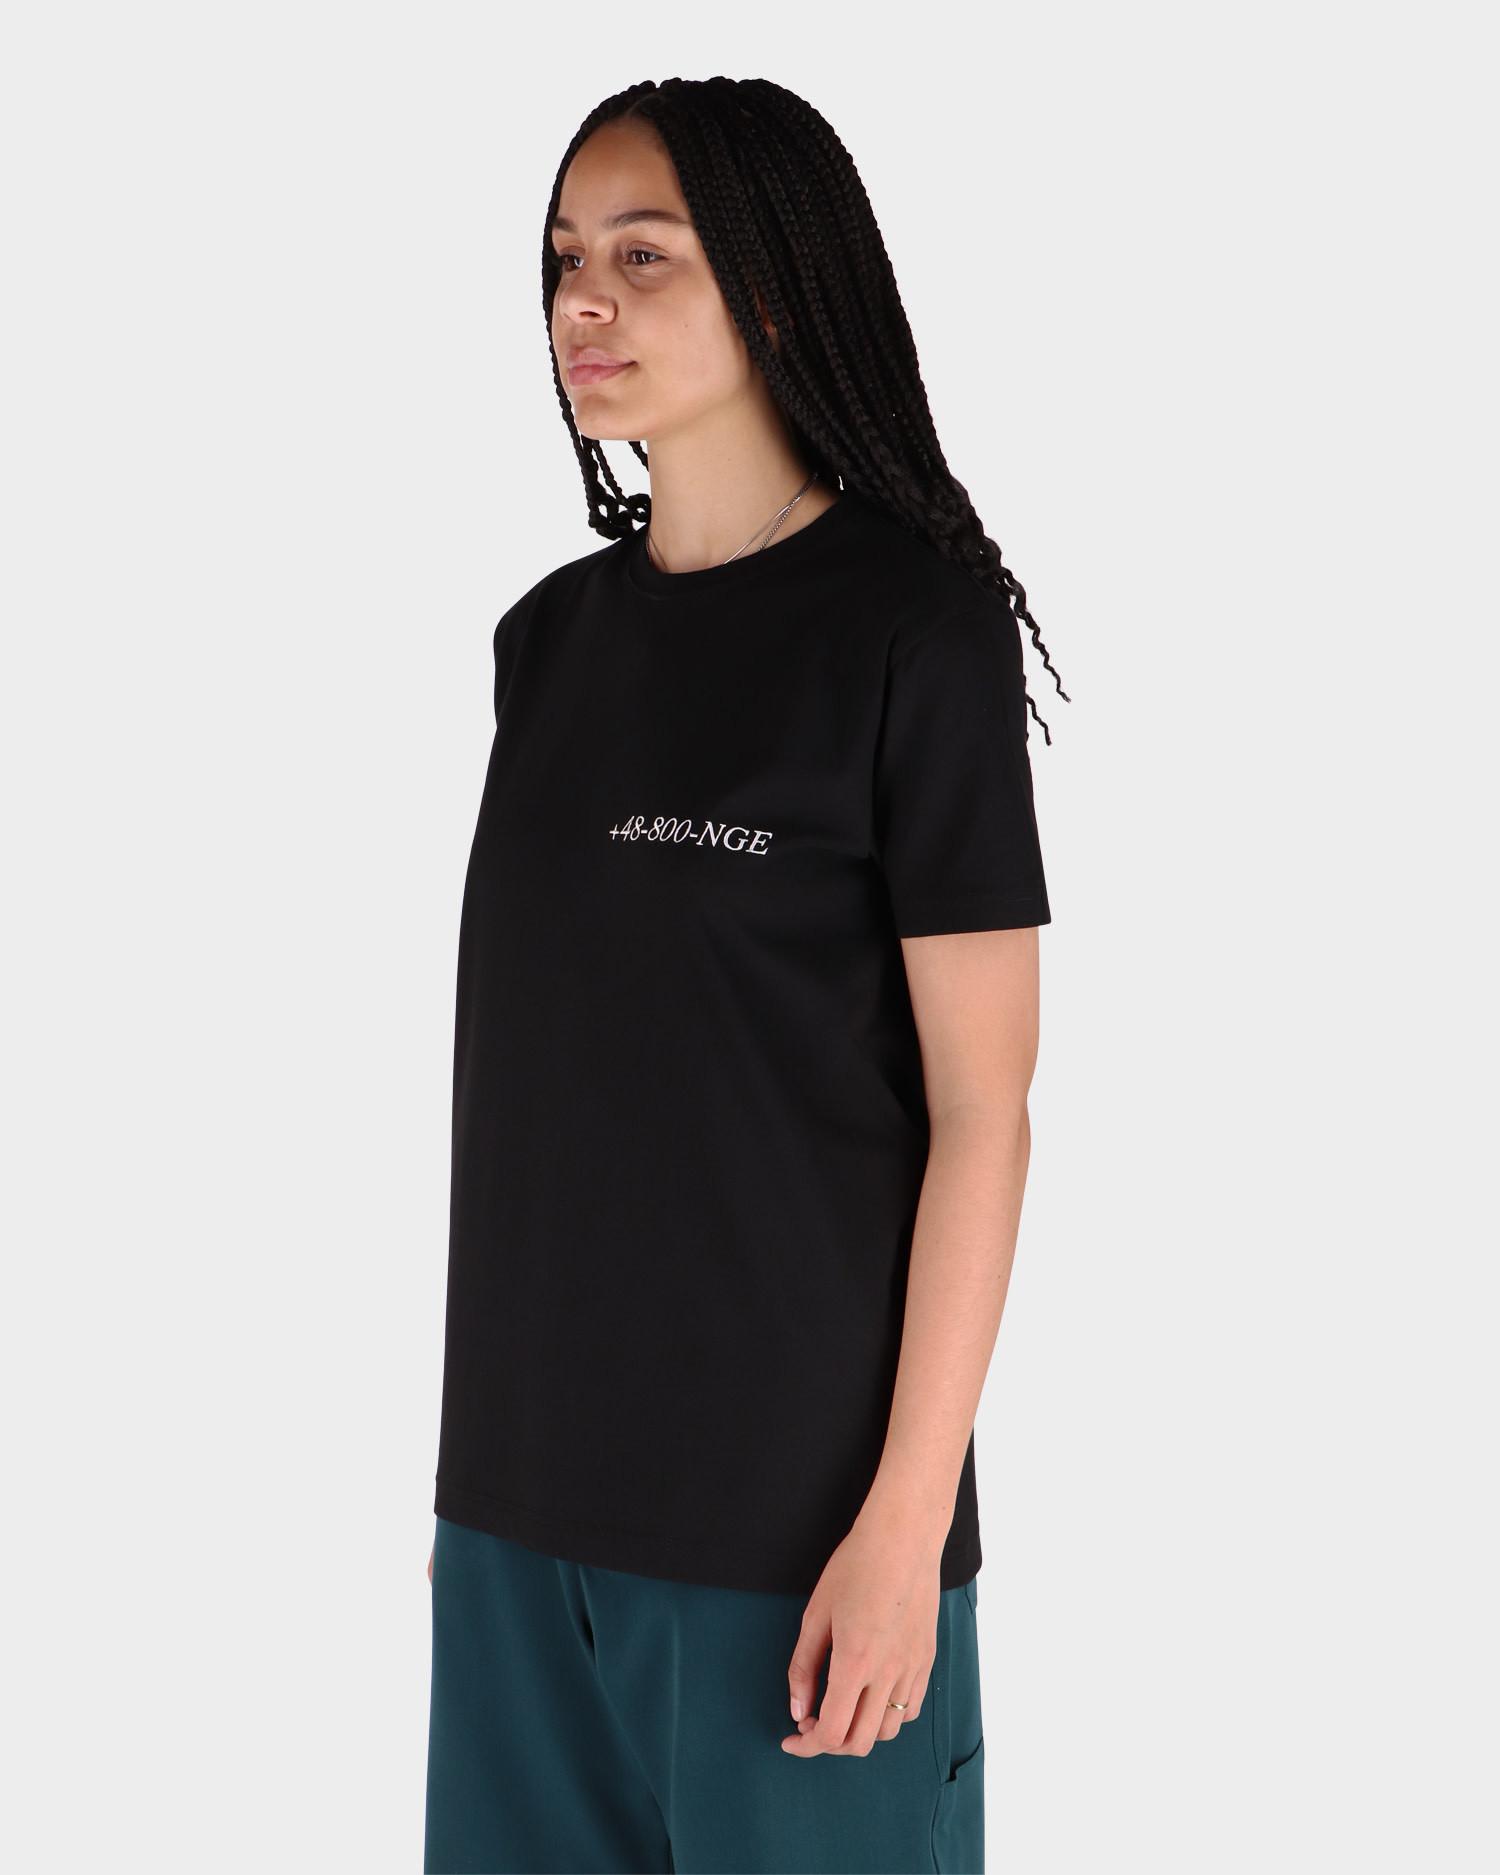 Neige Call Me T-Shirt Black